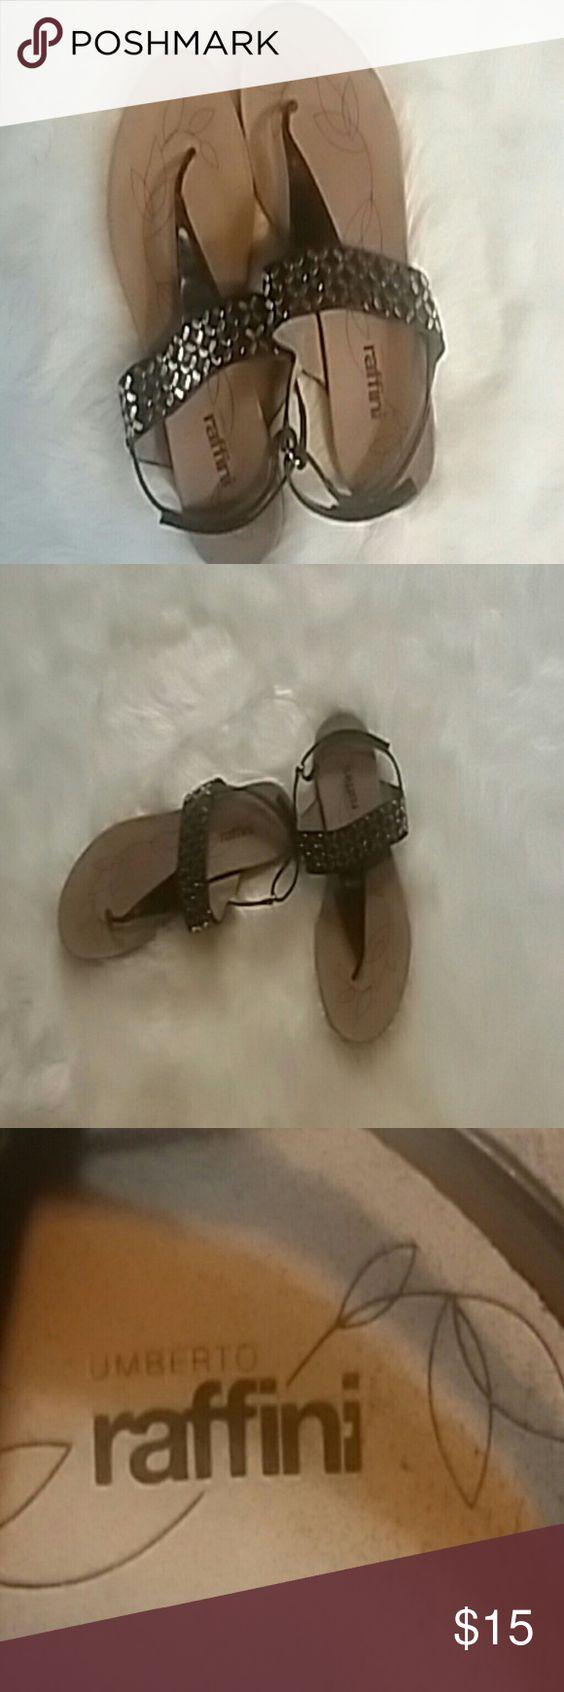 Black sandals size 11 - Umberto Raffinu Black Sandals Size 11 Raffini Black Sandals With Silver Embellishmrnts Size 11 These